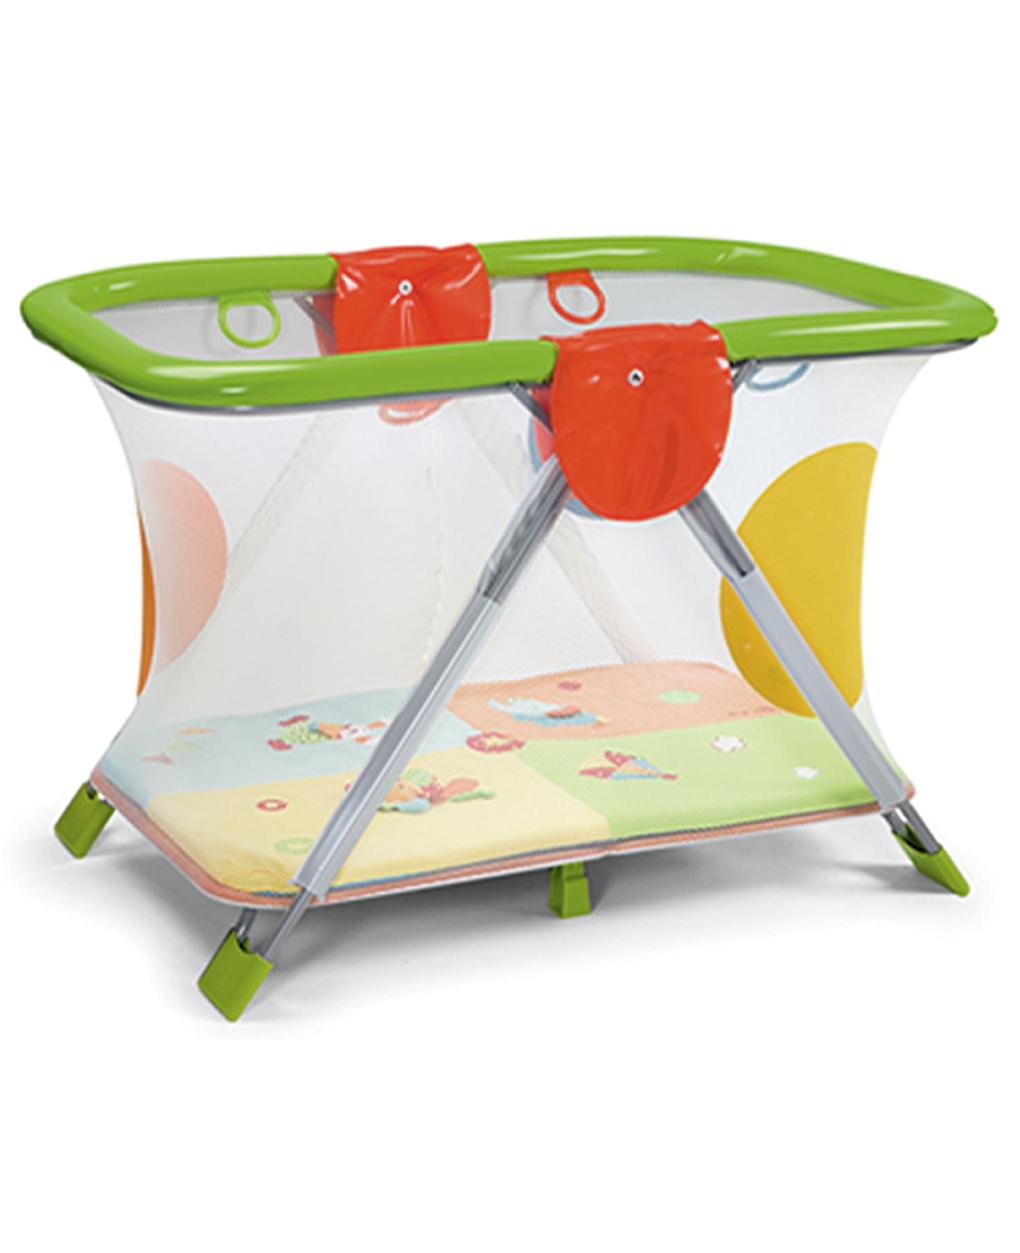 Brevi Πάρκο Μωρού Soft and Play Mondocirco